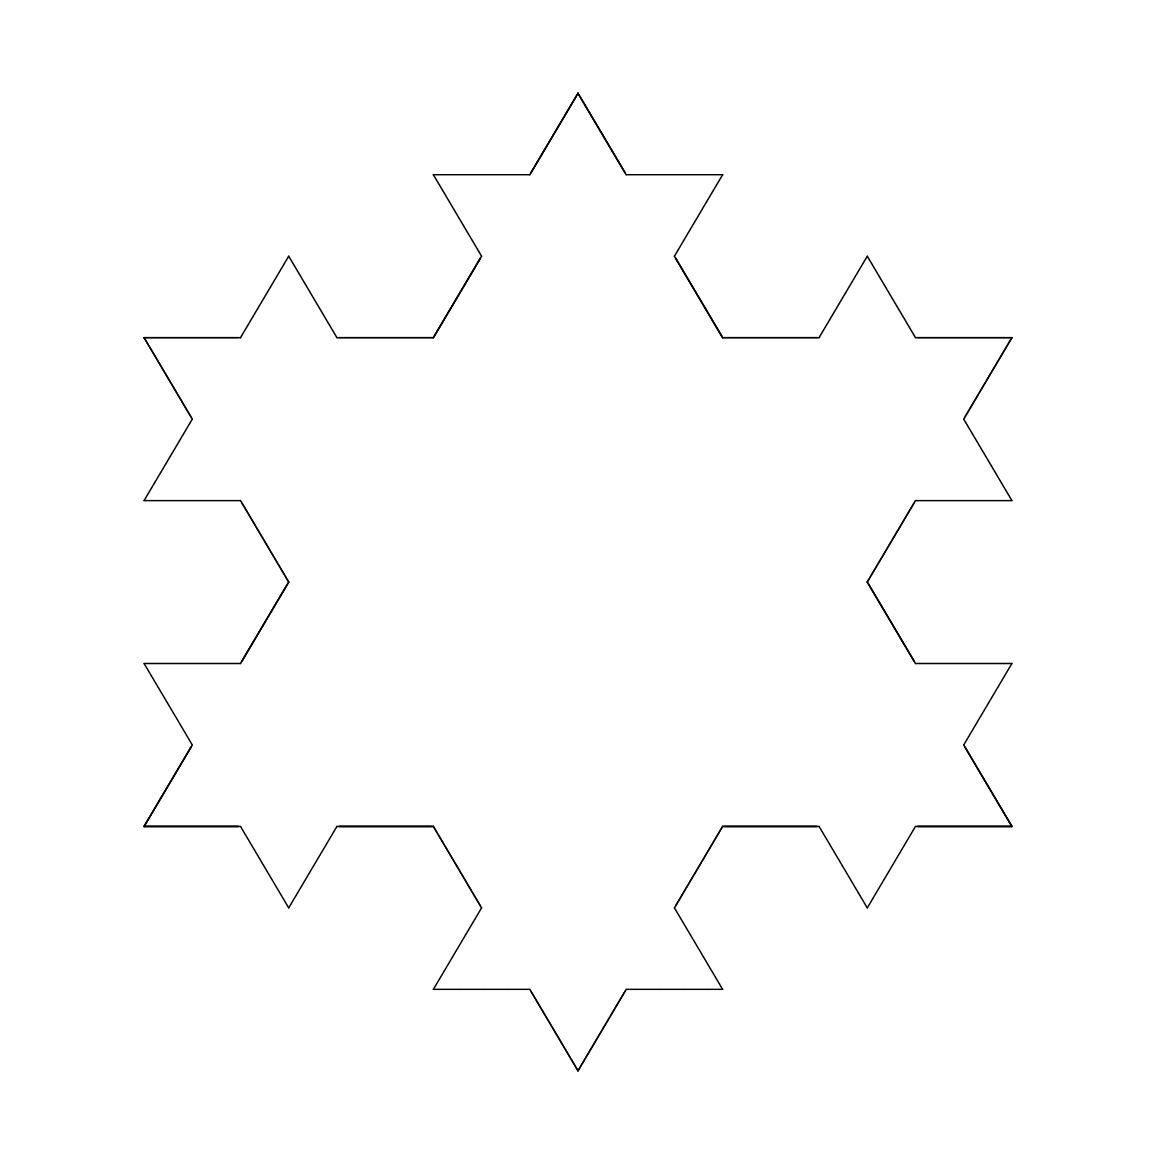 koch snowflakes meandering through mathematics